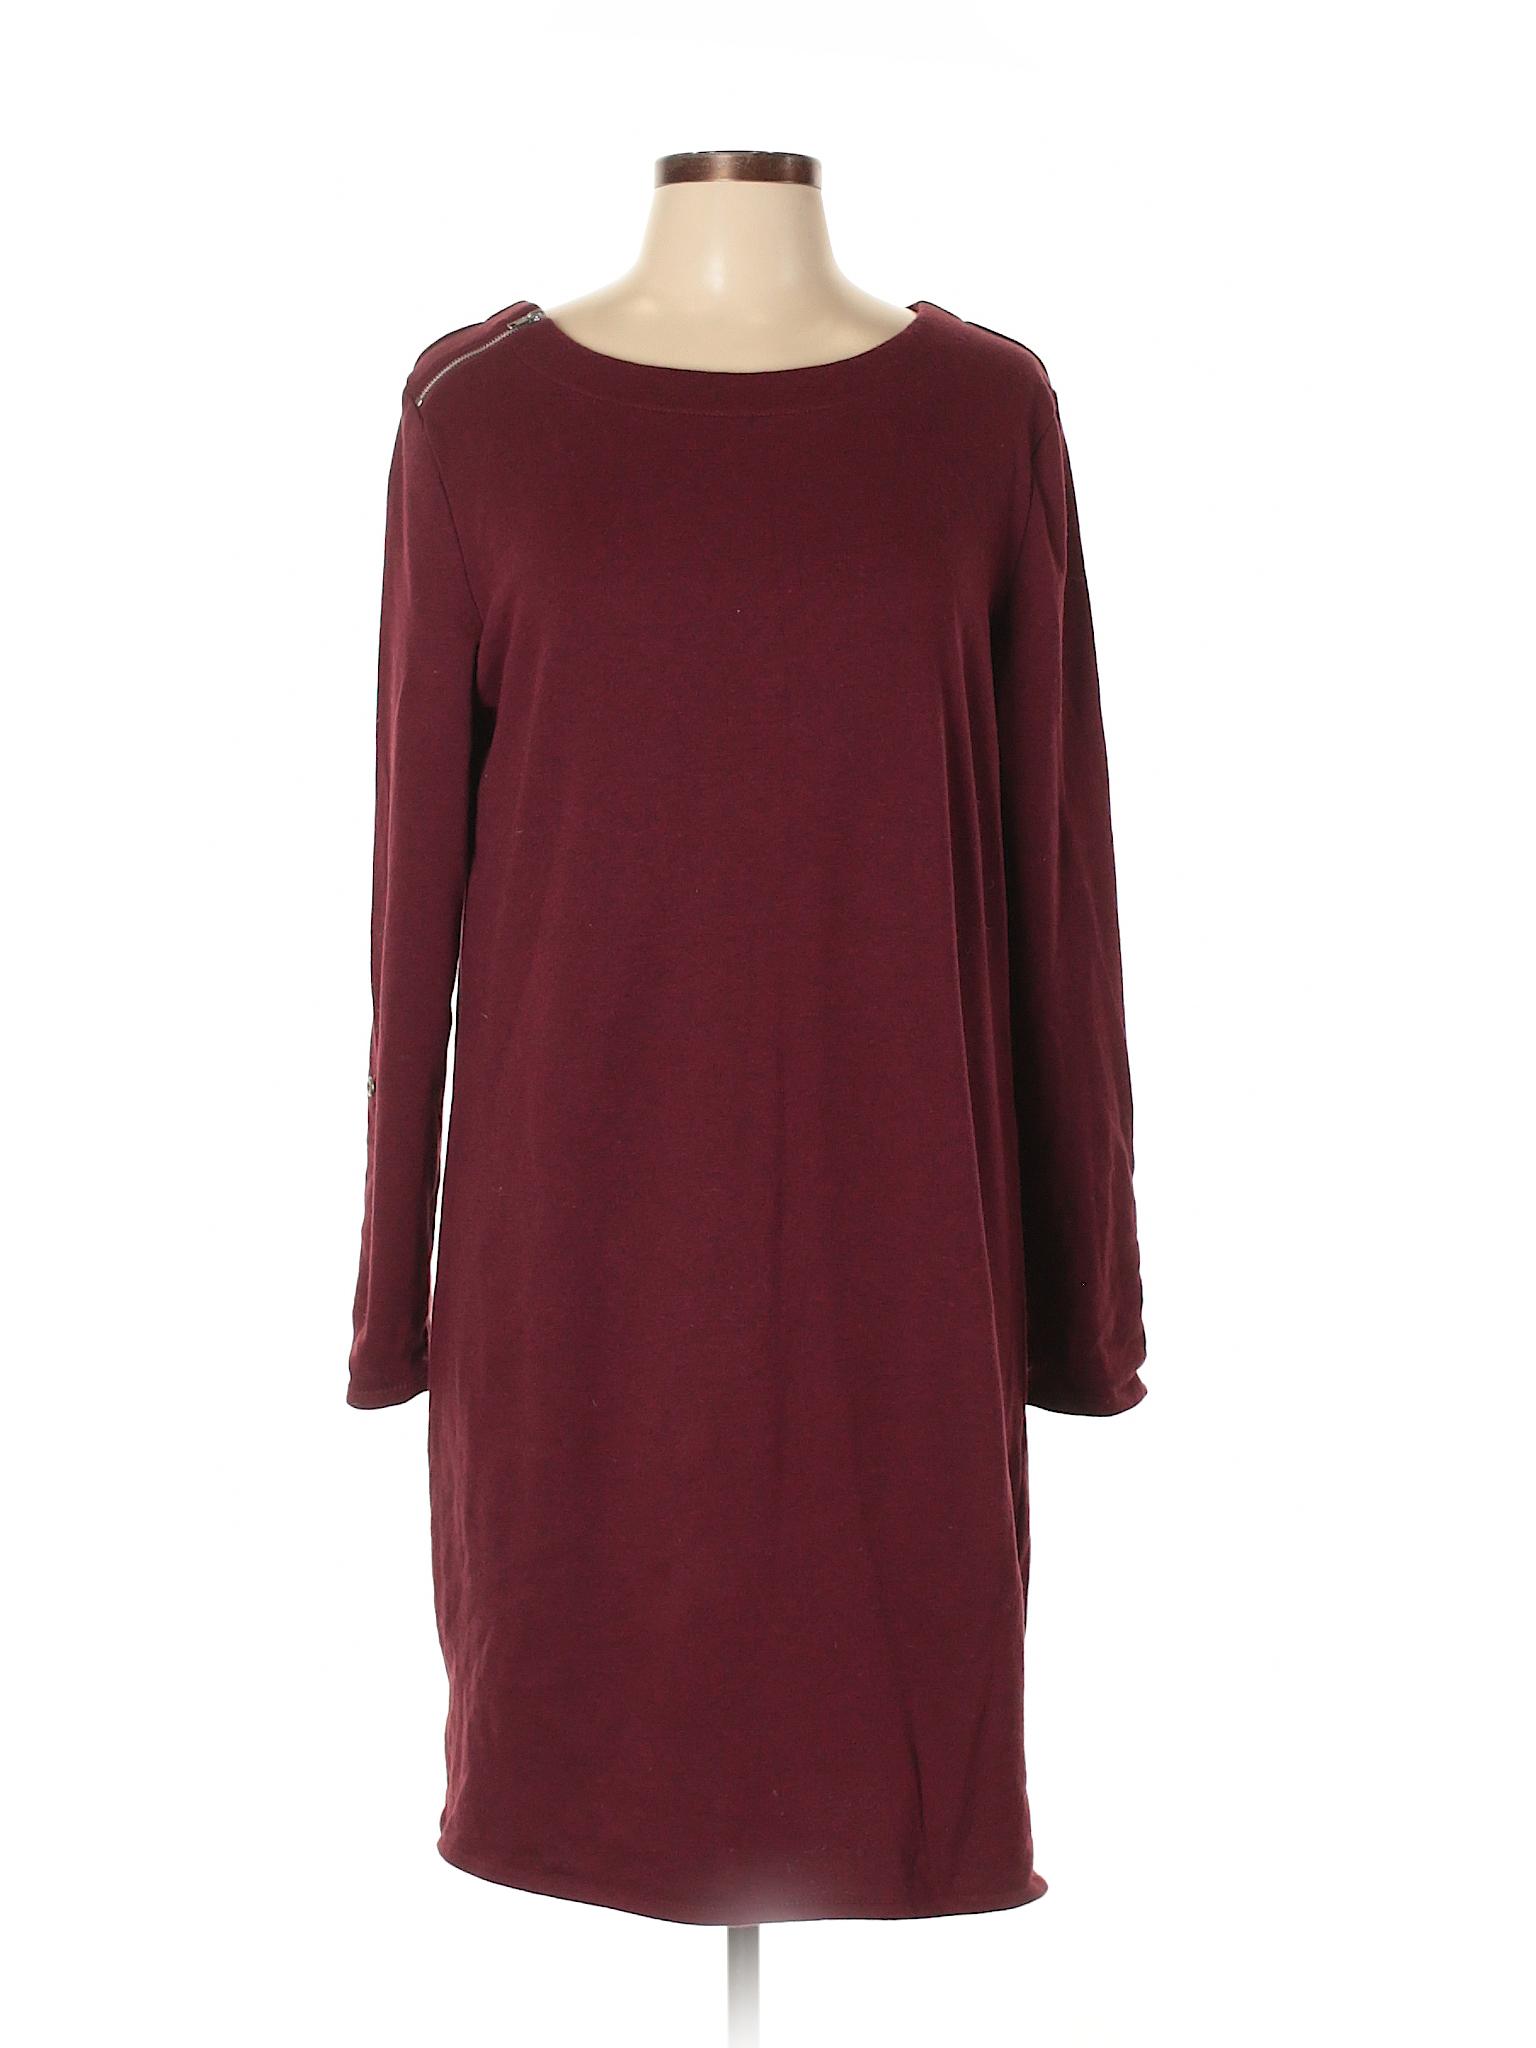 Merona Casual Dress Boutique Boutique Dress winter Merona Boutique Casual winter winter Merona dT1wApq